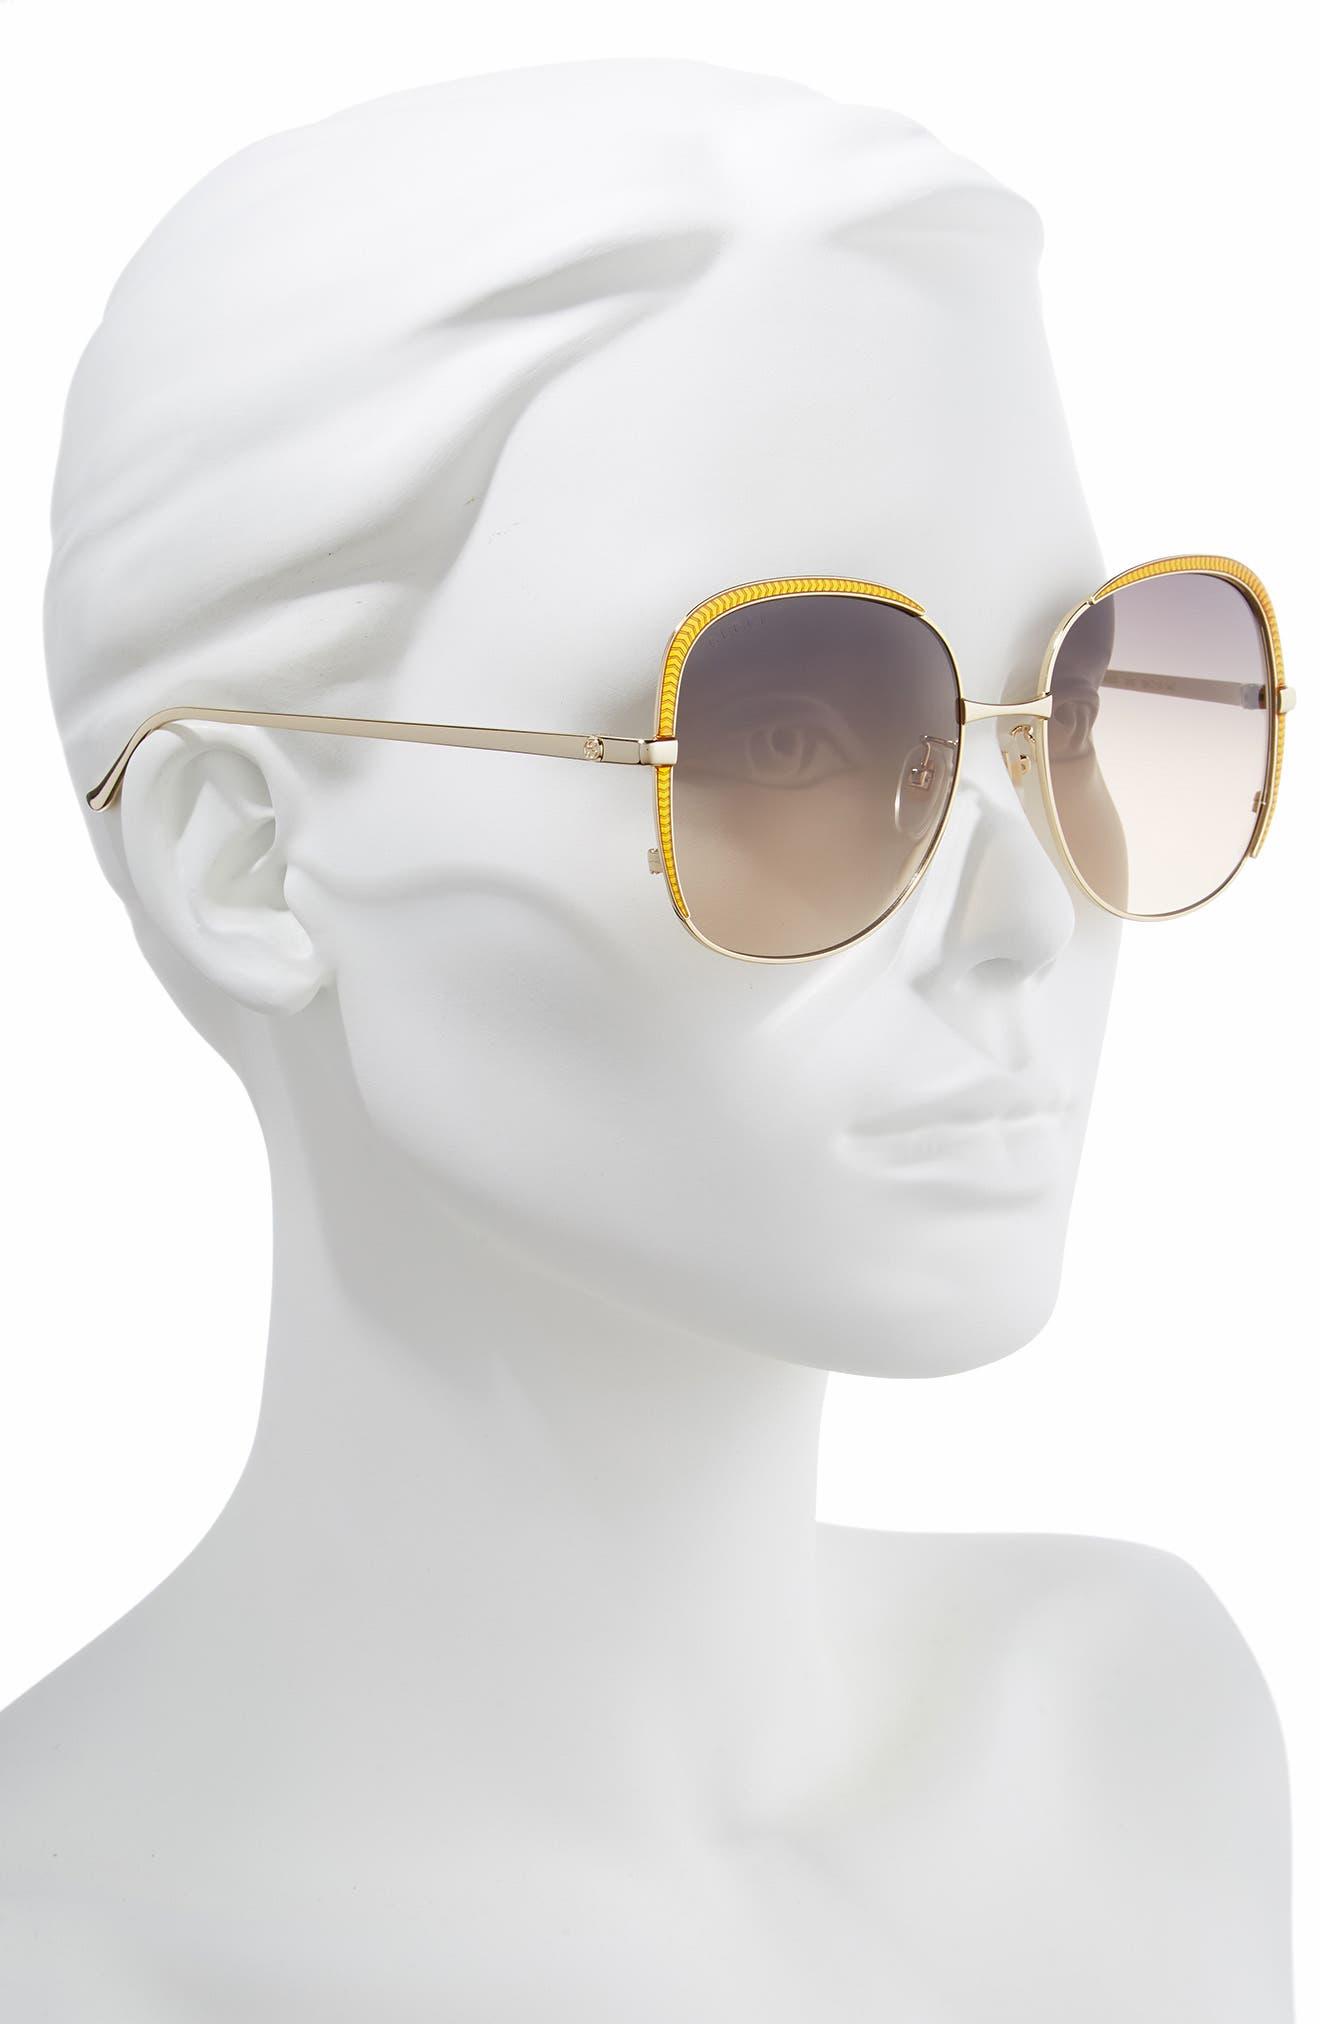 58mm Gradient Sunglasses,                             Alternate thumbnail 2, color,                             GOLD/ PINK/ GREY GRADIENT